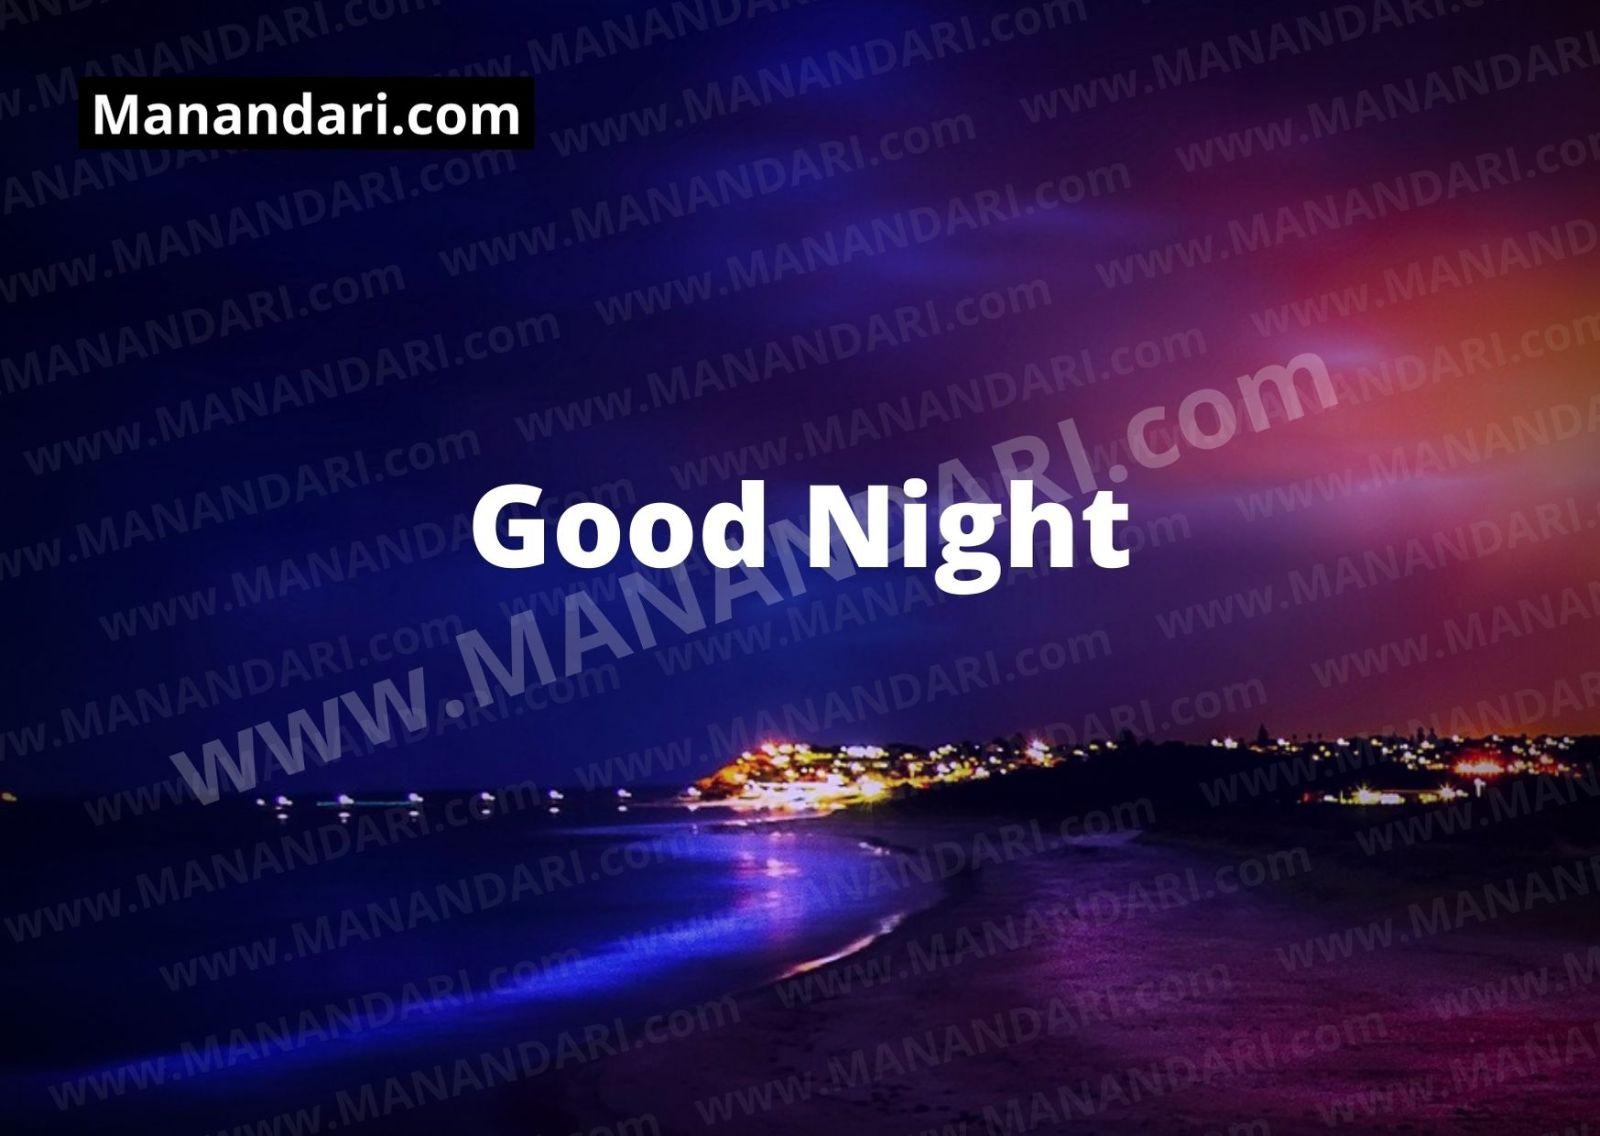 Good Night - 12